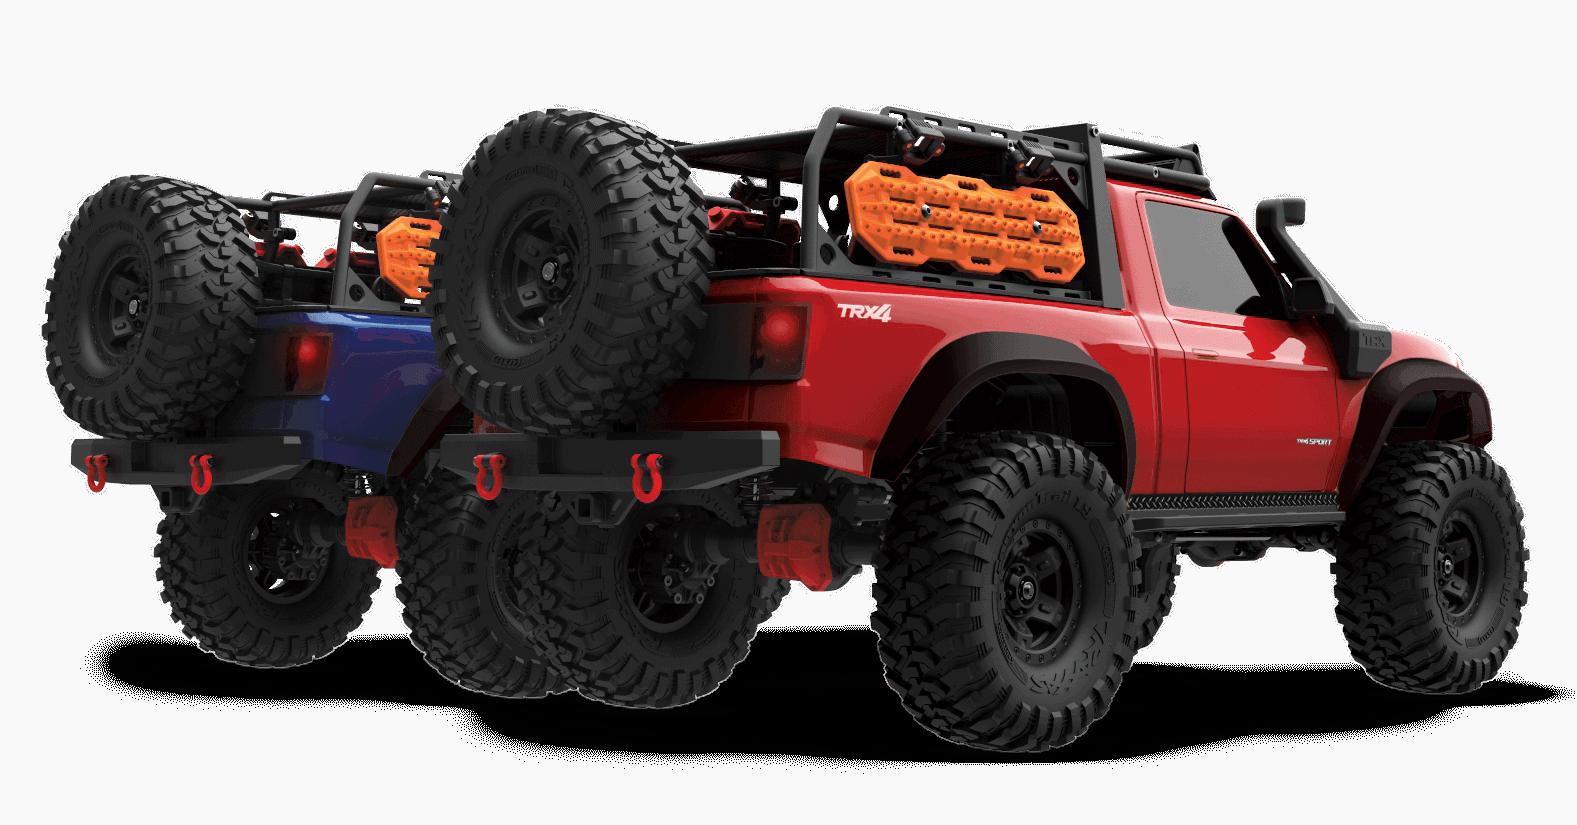 Custom Traxxas Nitro Sport 1 10 Scale 2wd Rustler Stadium Truck 44094 Upcoming Accessories Newb 1458x763